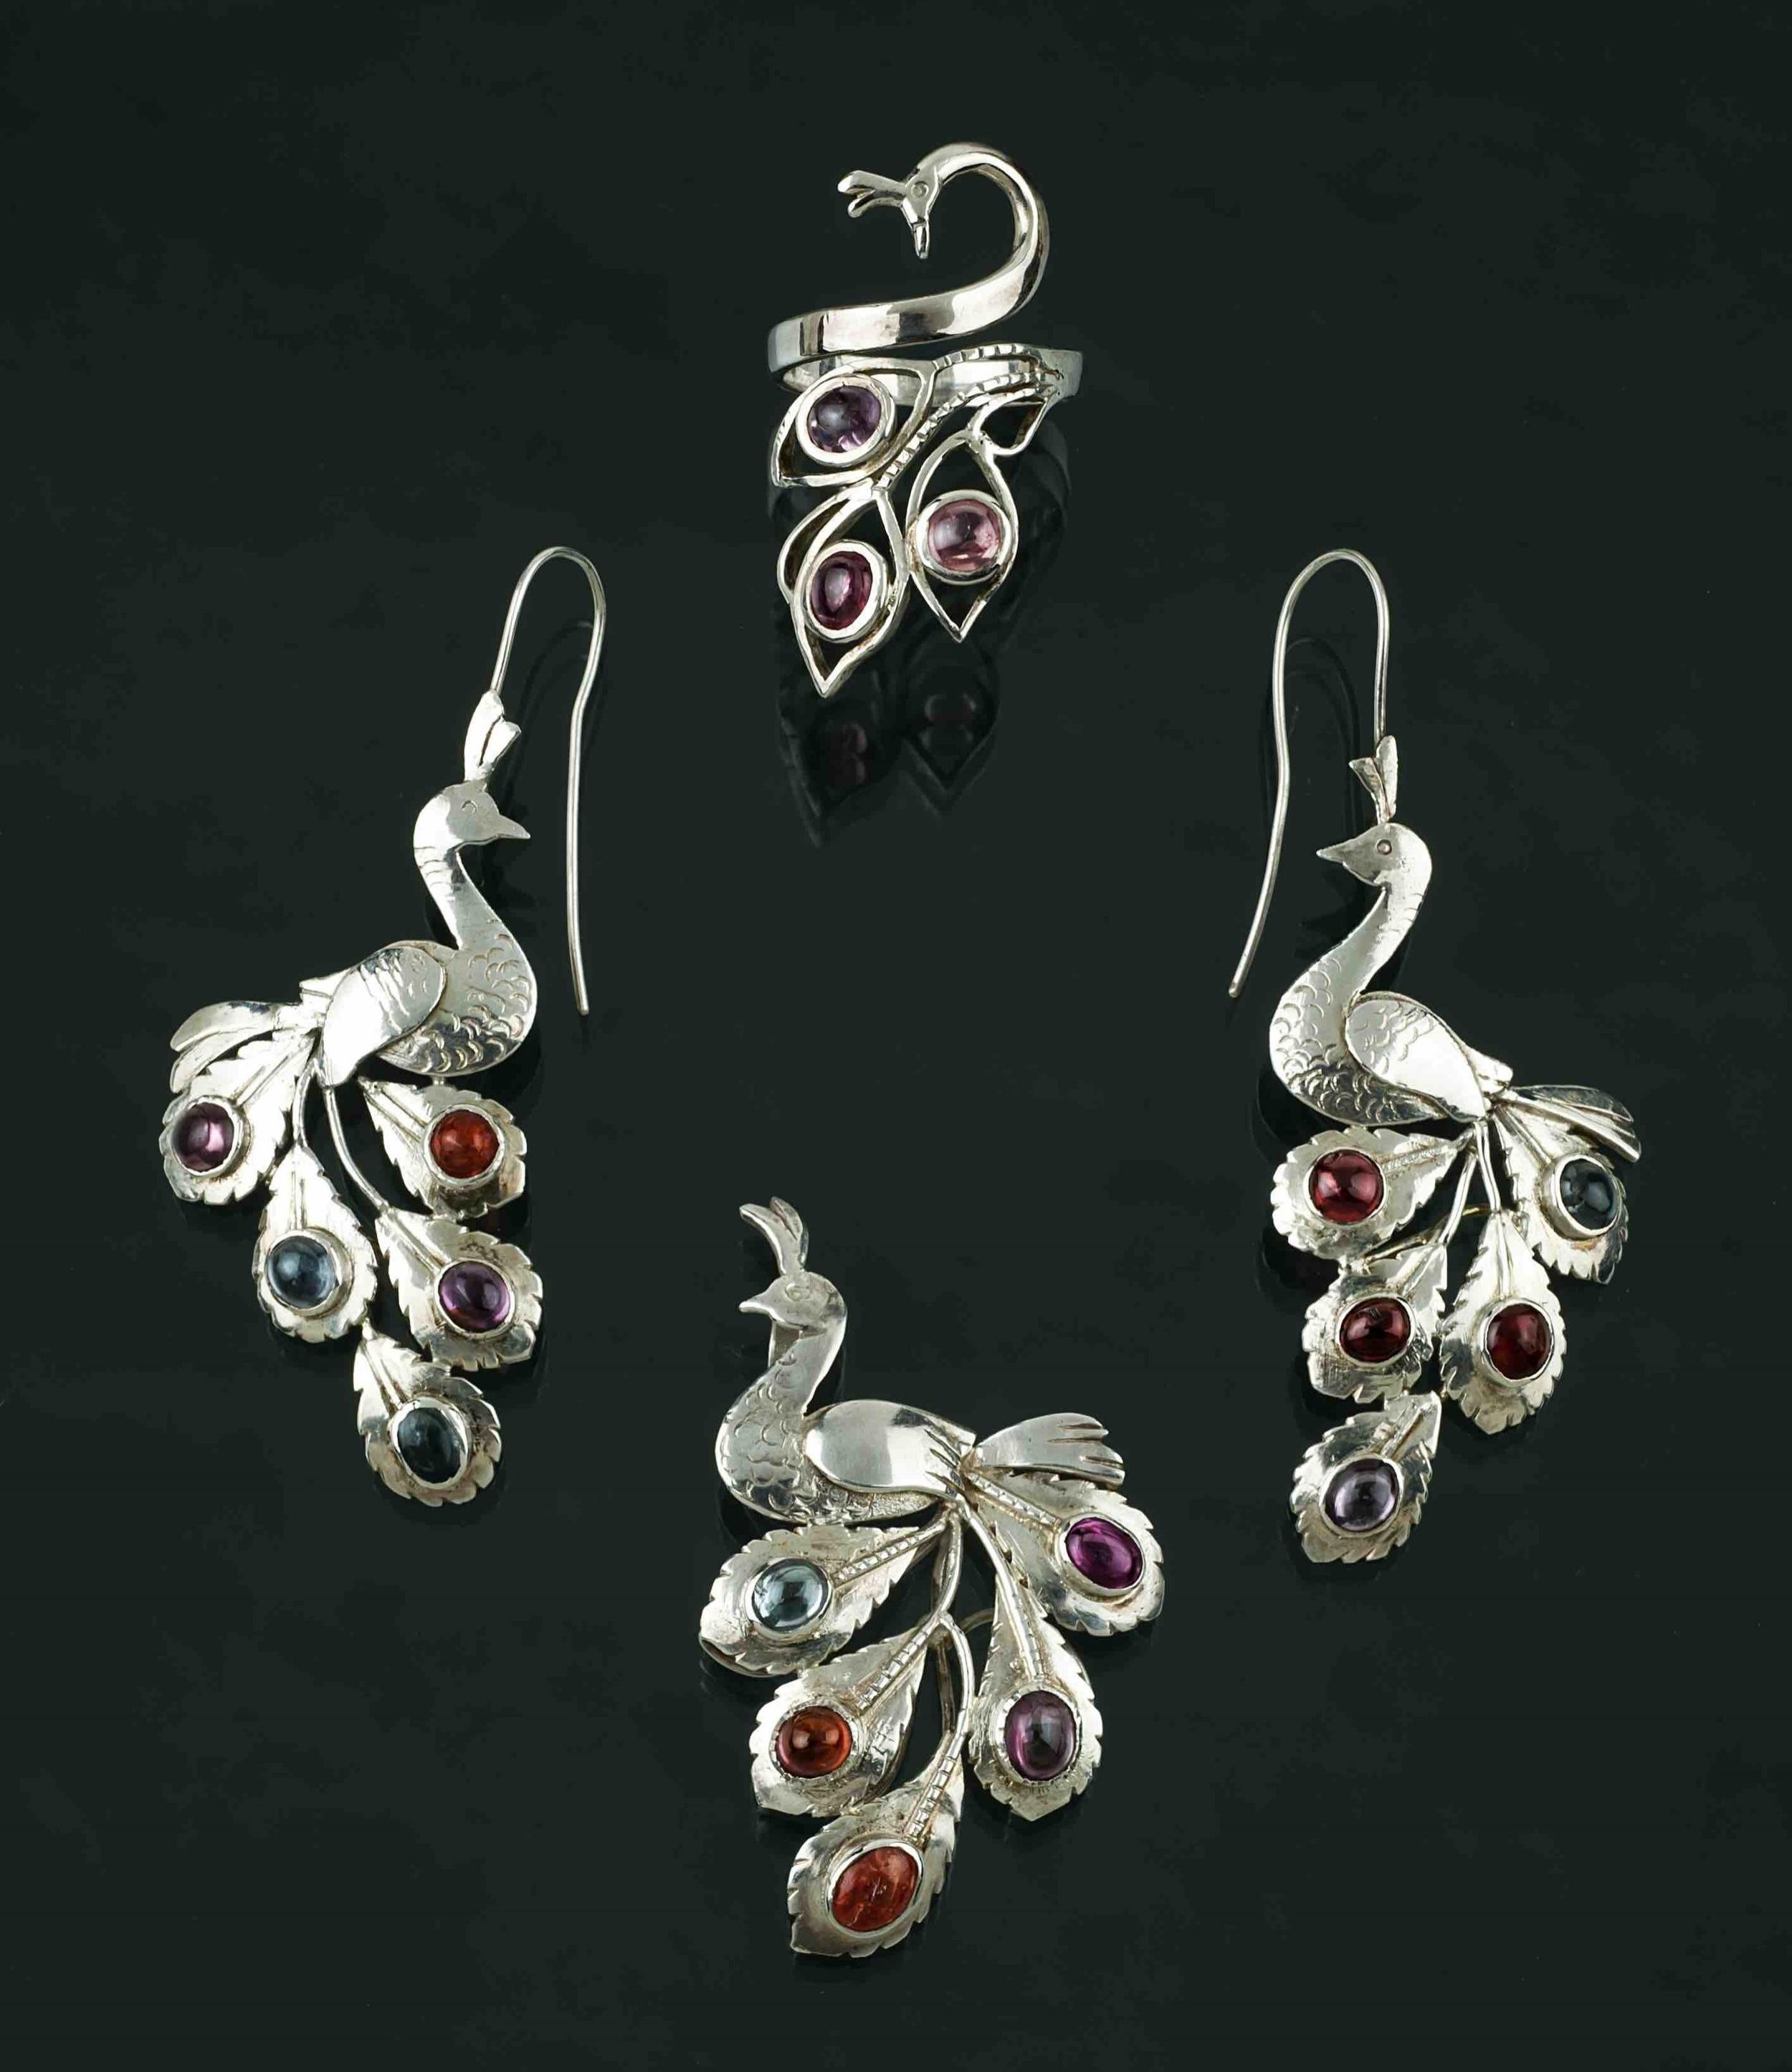 Mia Ruby Peacock jewellery